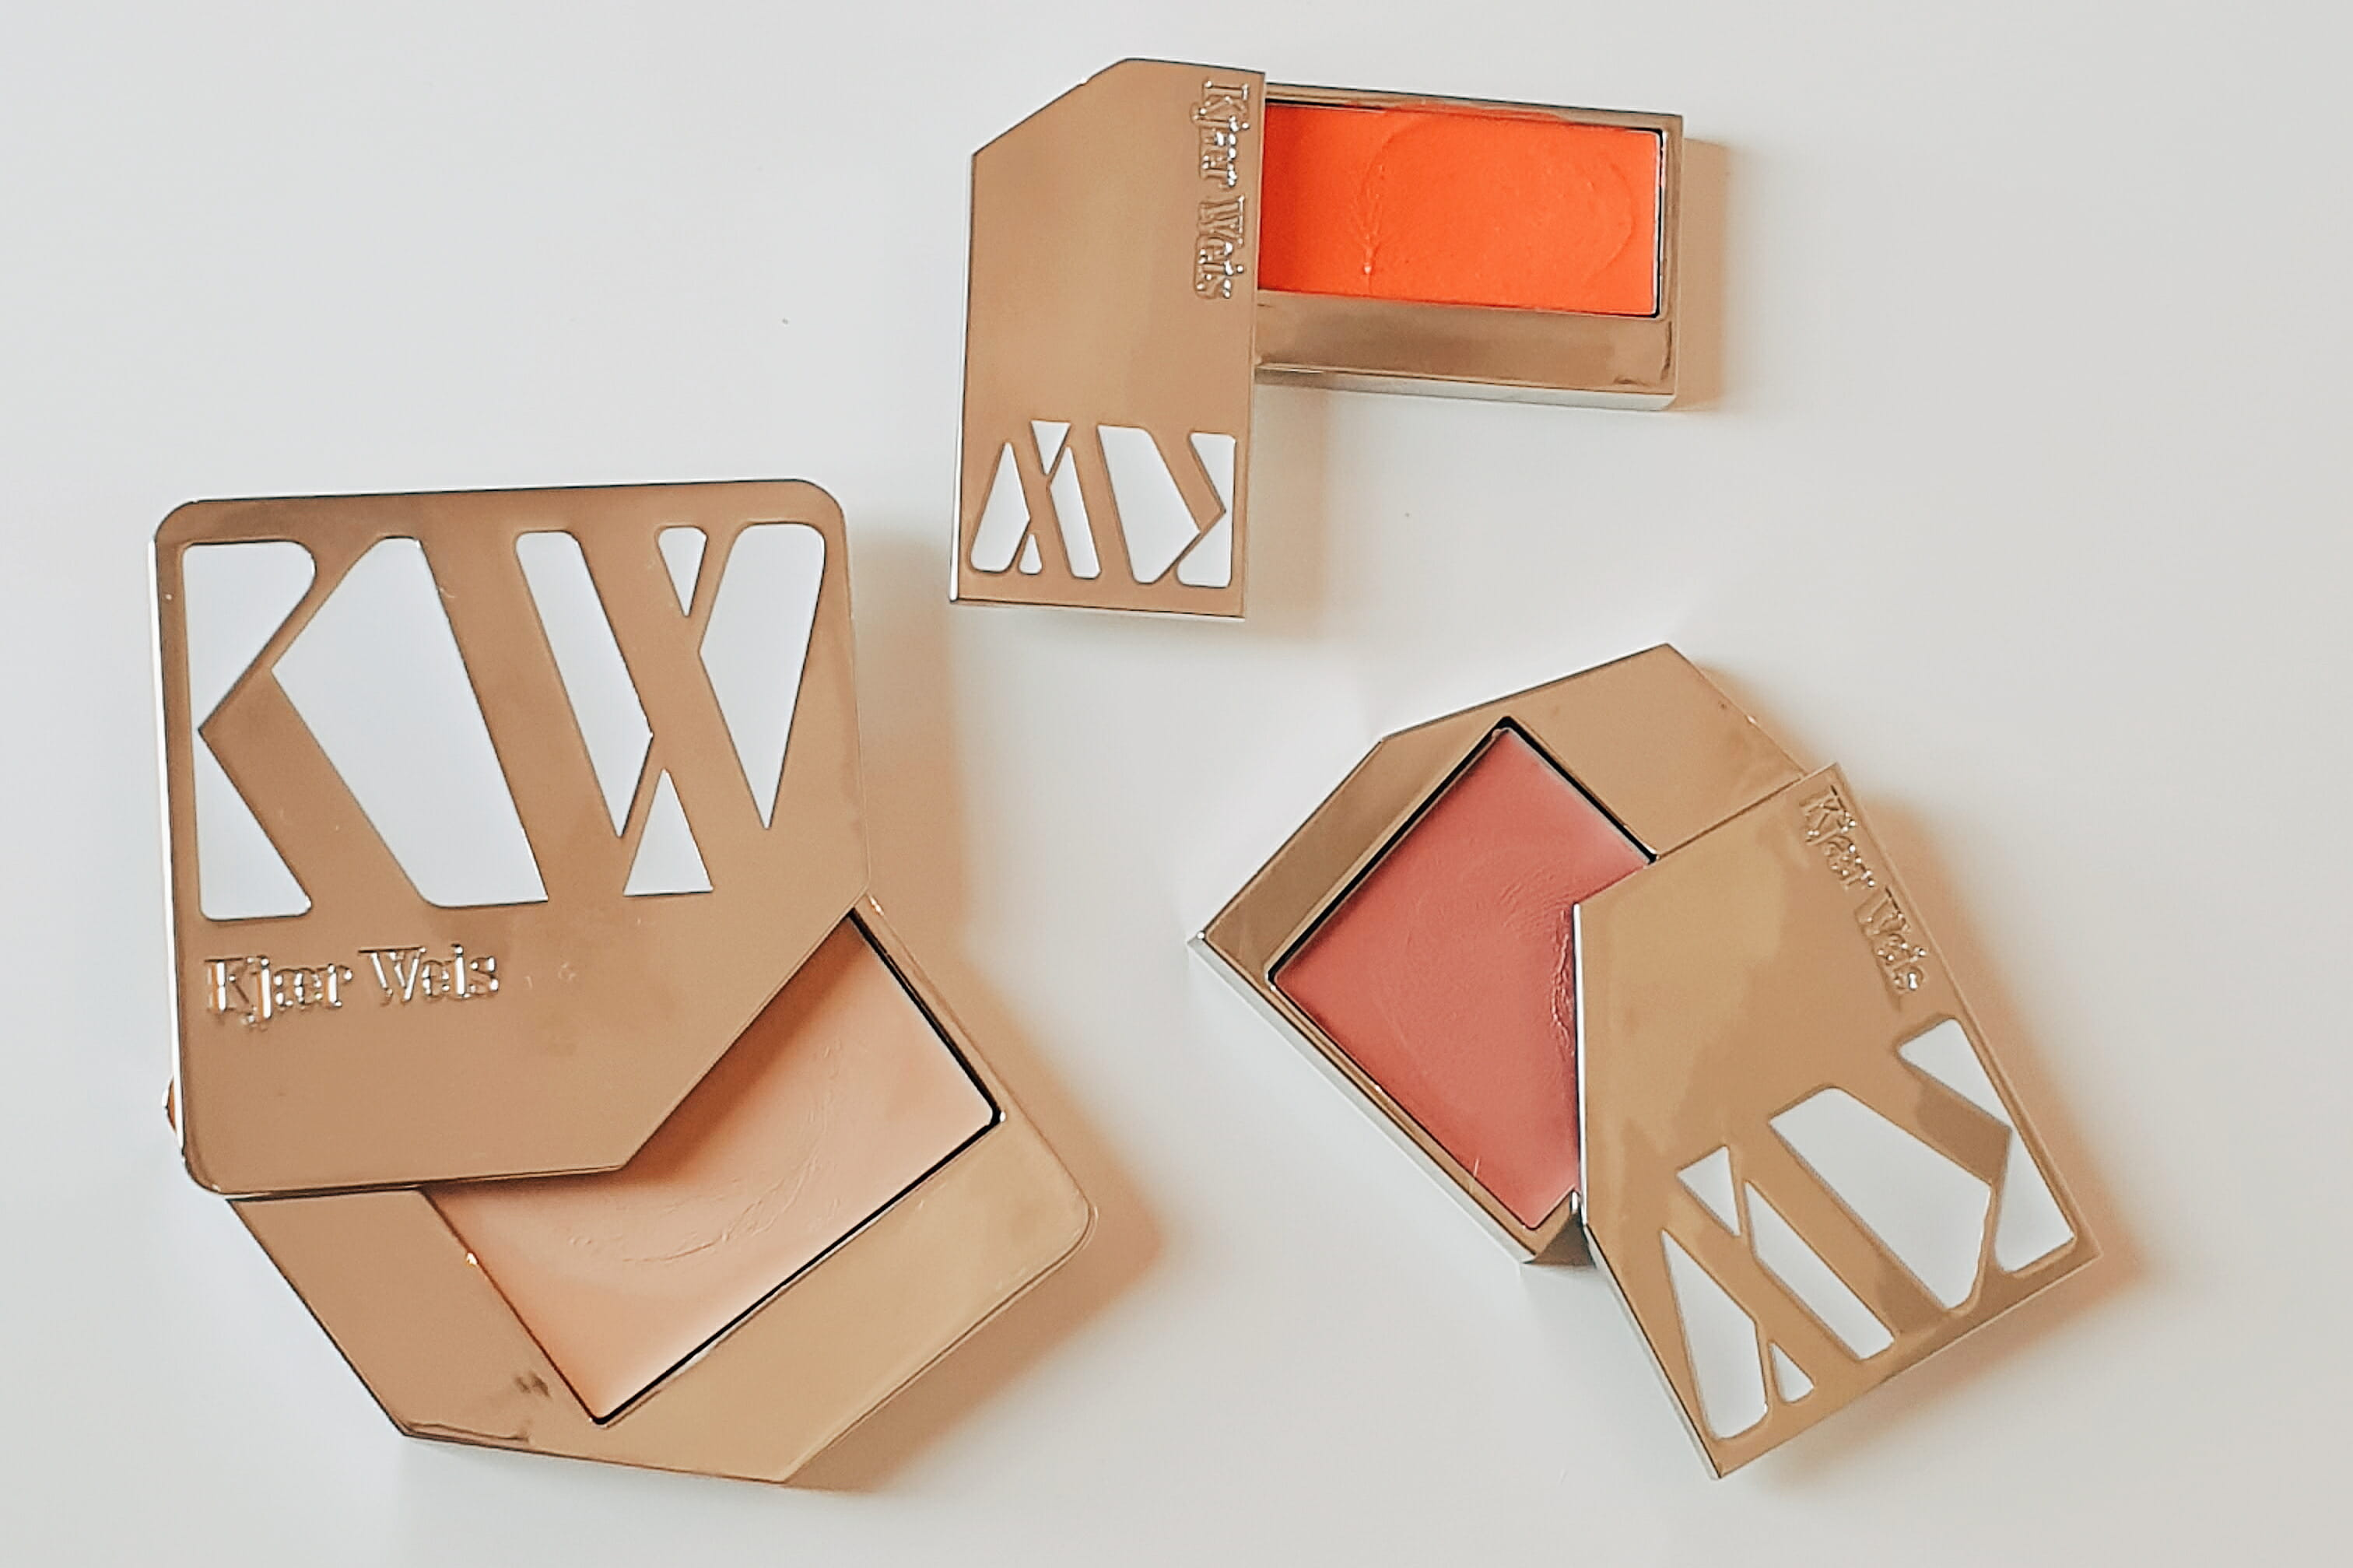 Kjaer Weis brand review